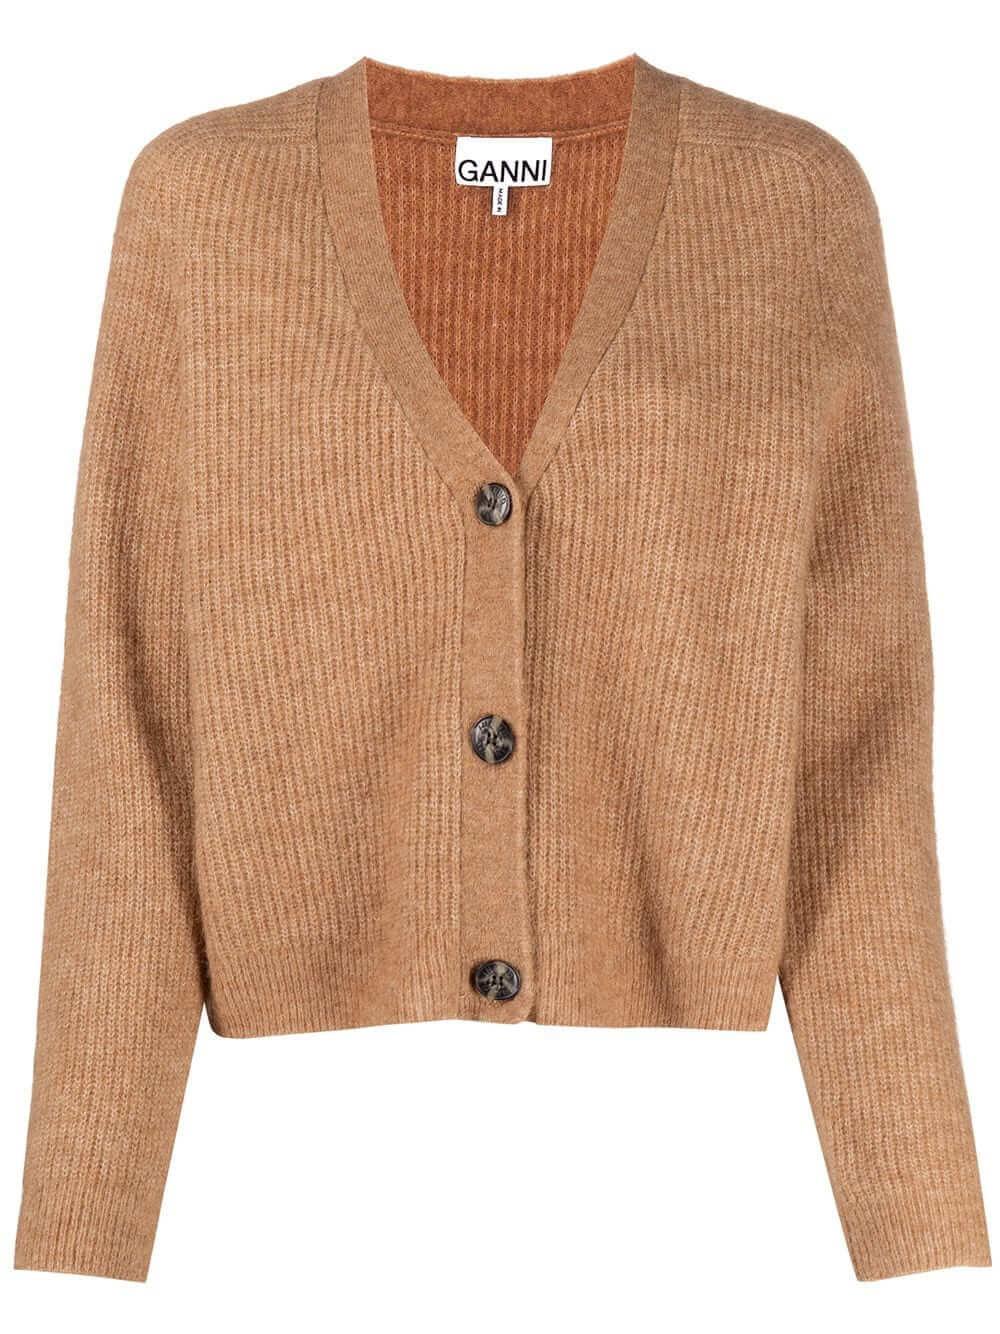 Wool 3 Button Cardigan